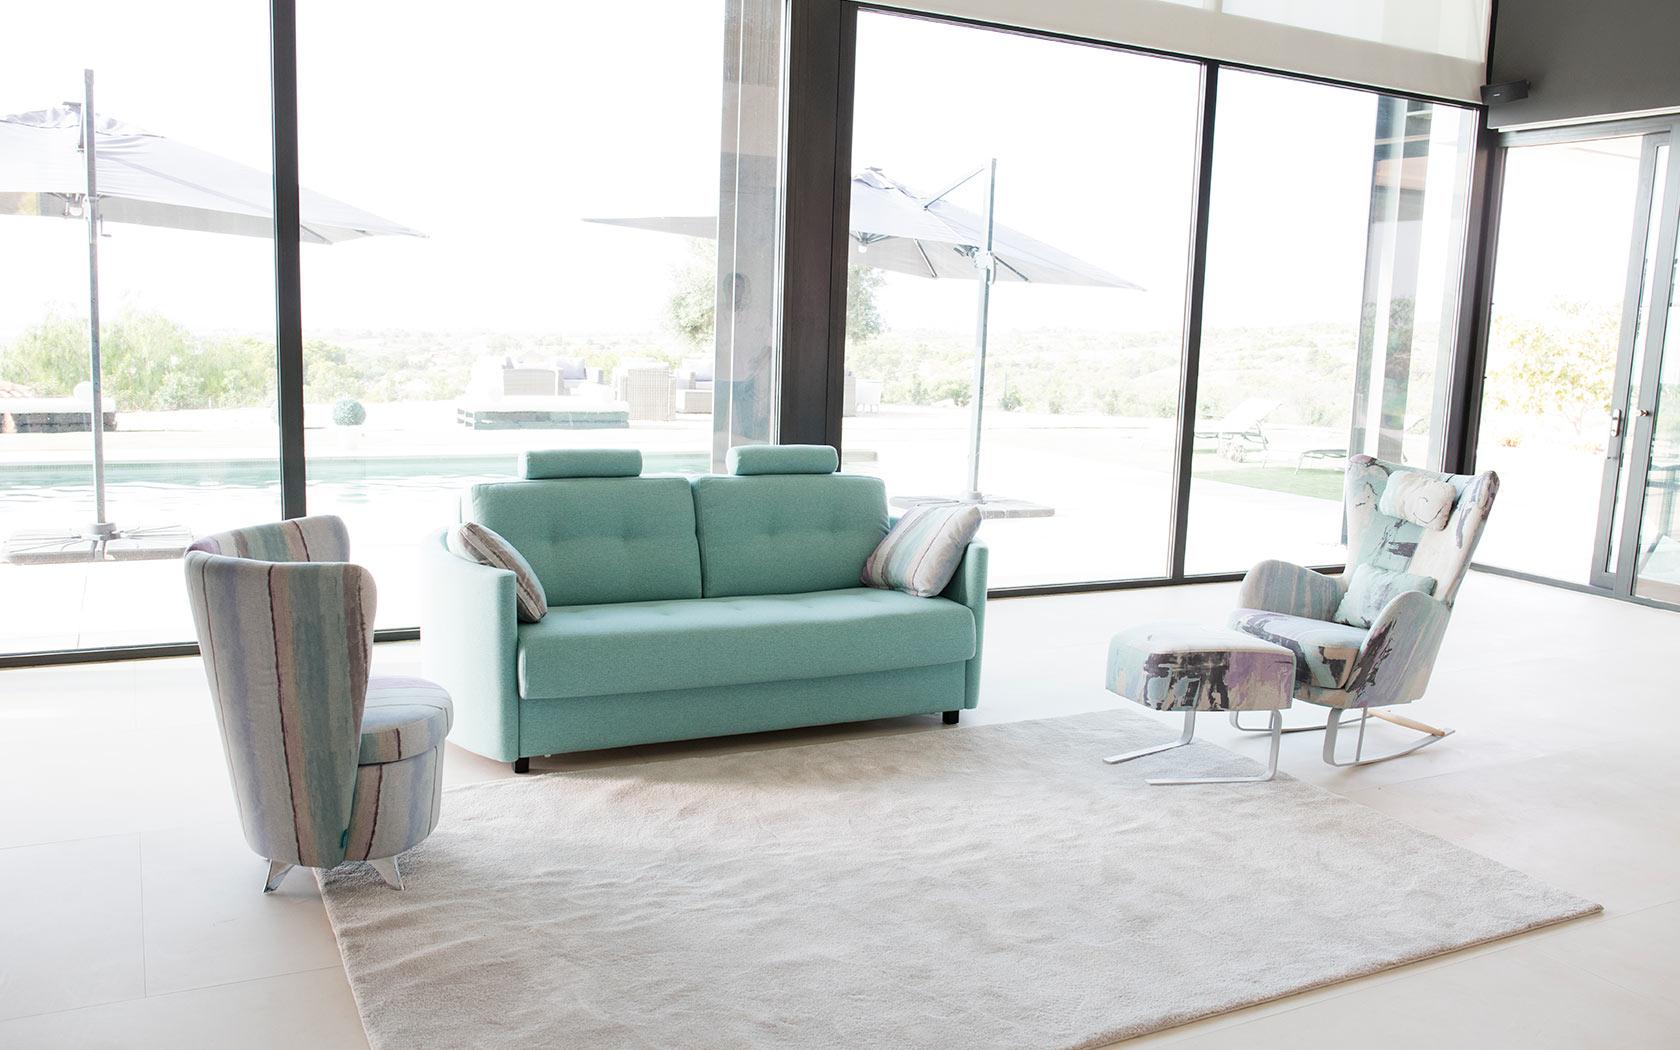 Bolero sofa cama 2019 01